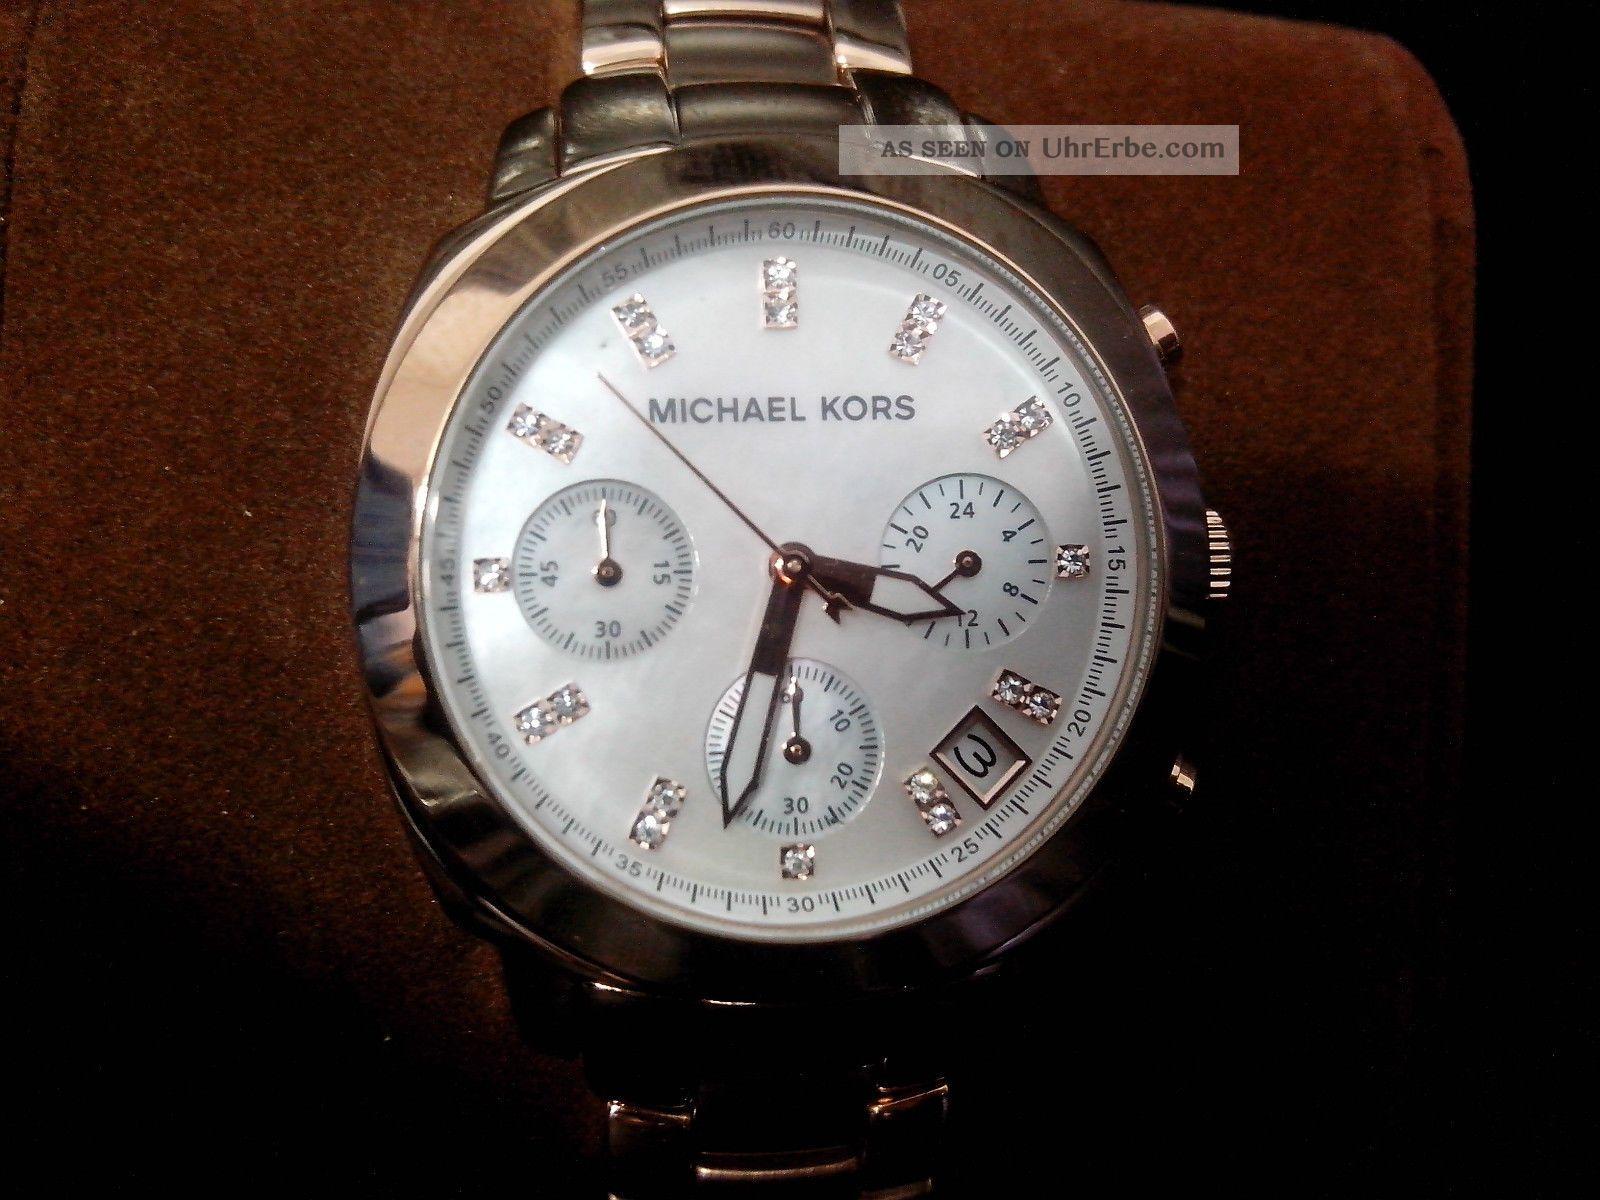 °°michael Kors°° Damenuhr°° Uvp: 249 Eur°° Mit Etikett Armbanduhren Bild